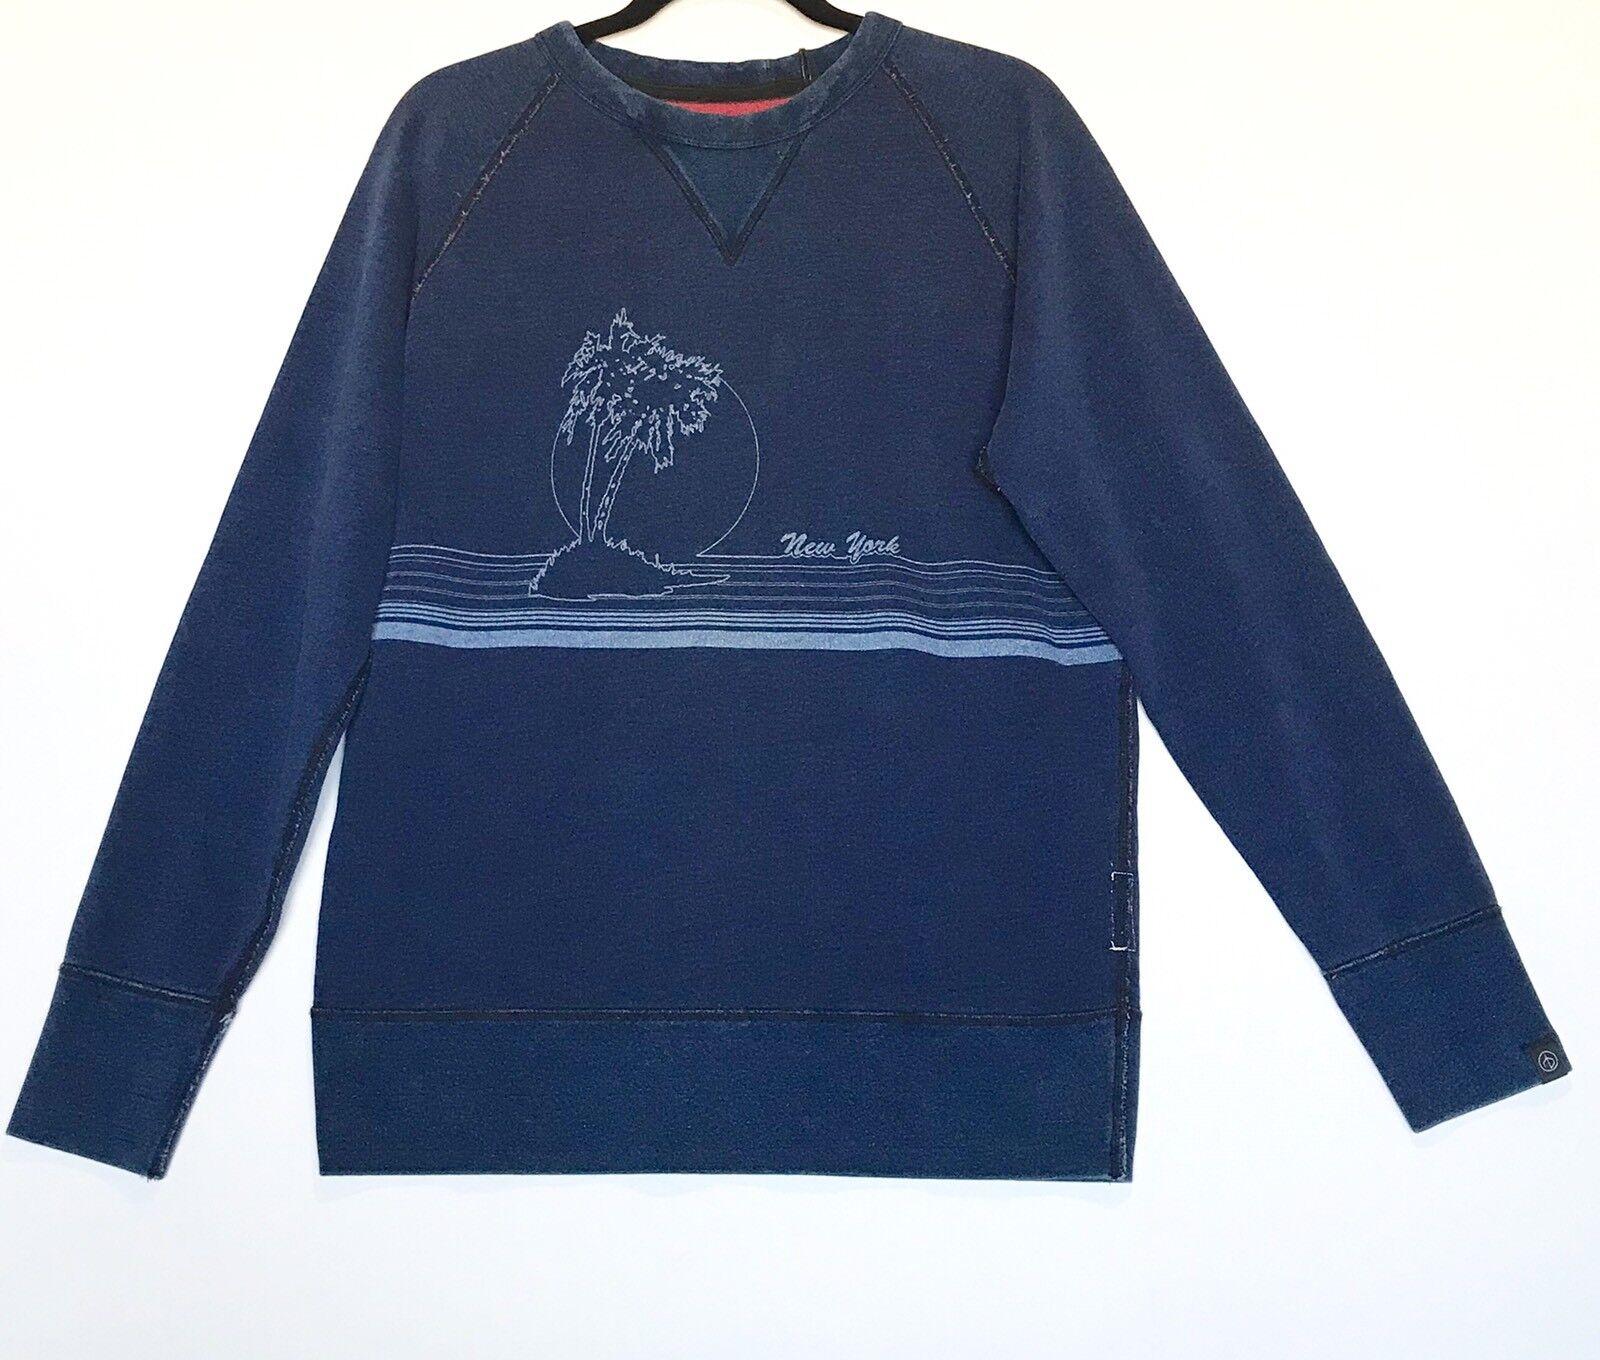 Rag & bone Vacation Indigo Sweatshirt Cotton Sz S Retails 295 Price 92 NWT